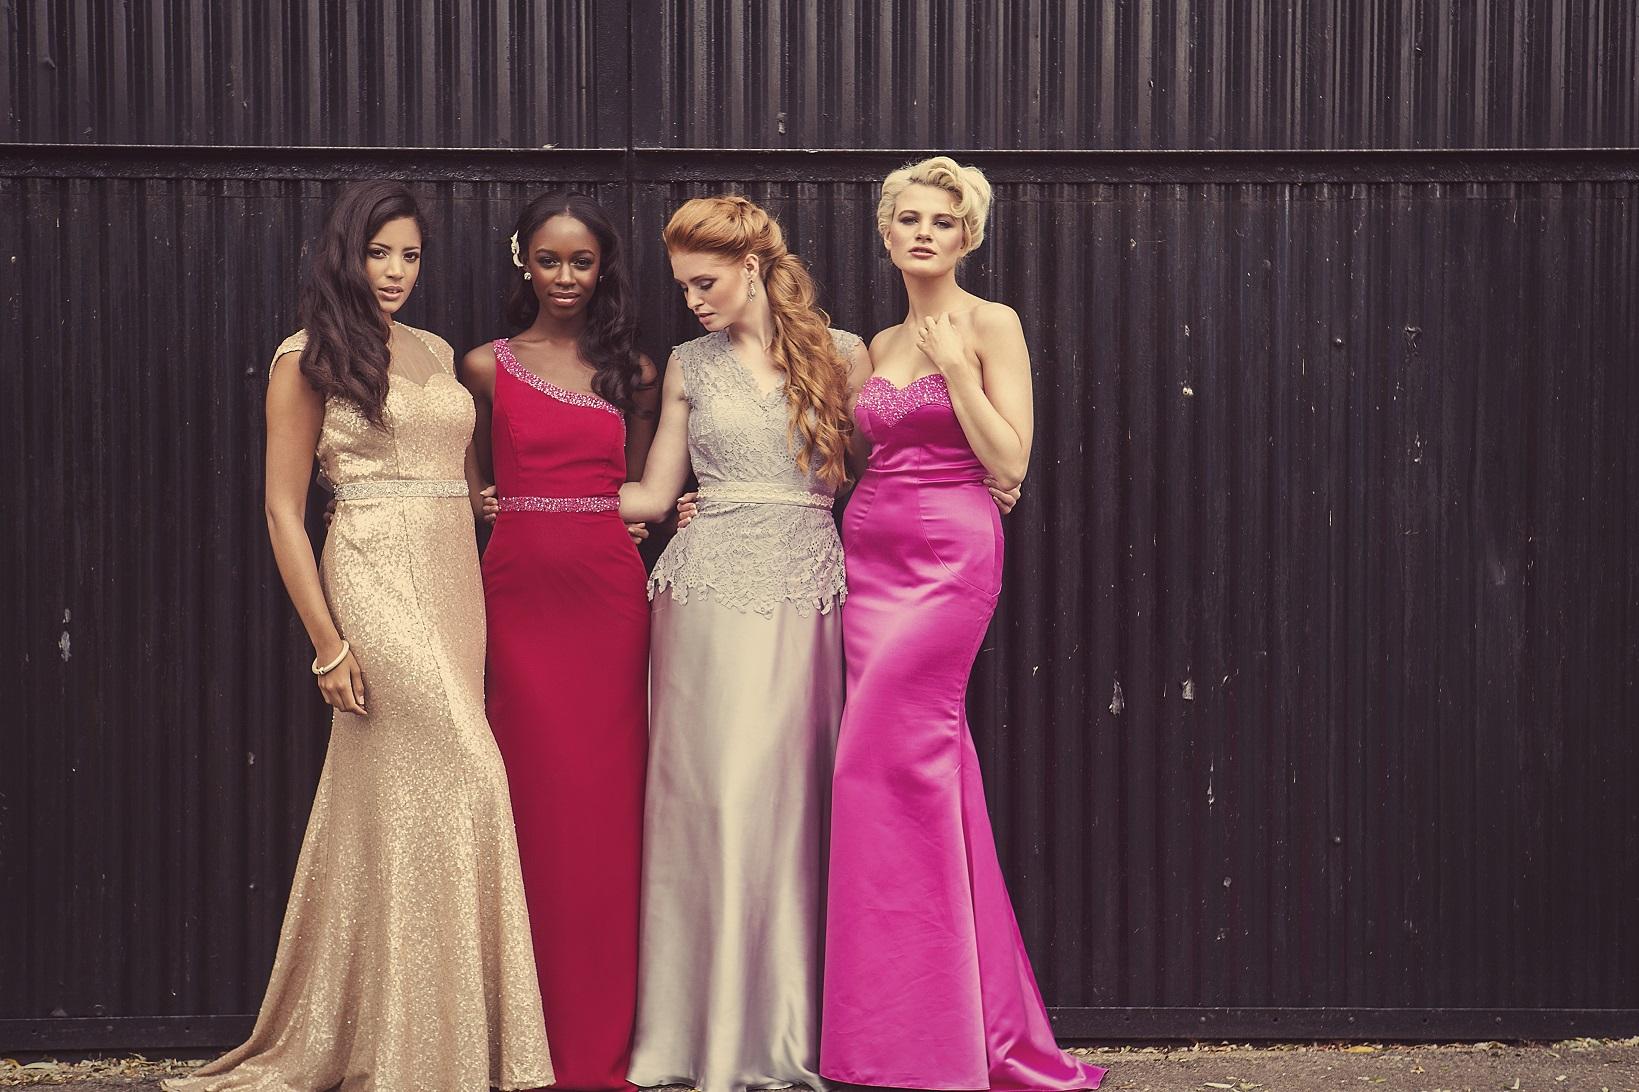 Bridal collection launch in milton keynes estilo moda bridal bridesmaids dresses milton keynes london united kingdom chiffon ombrellifo Images